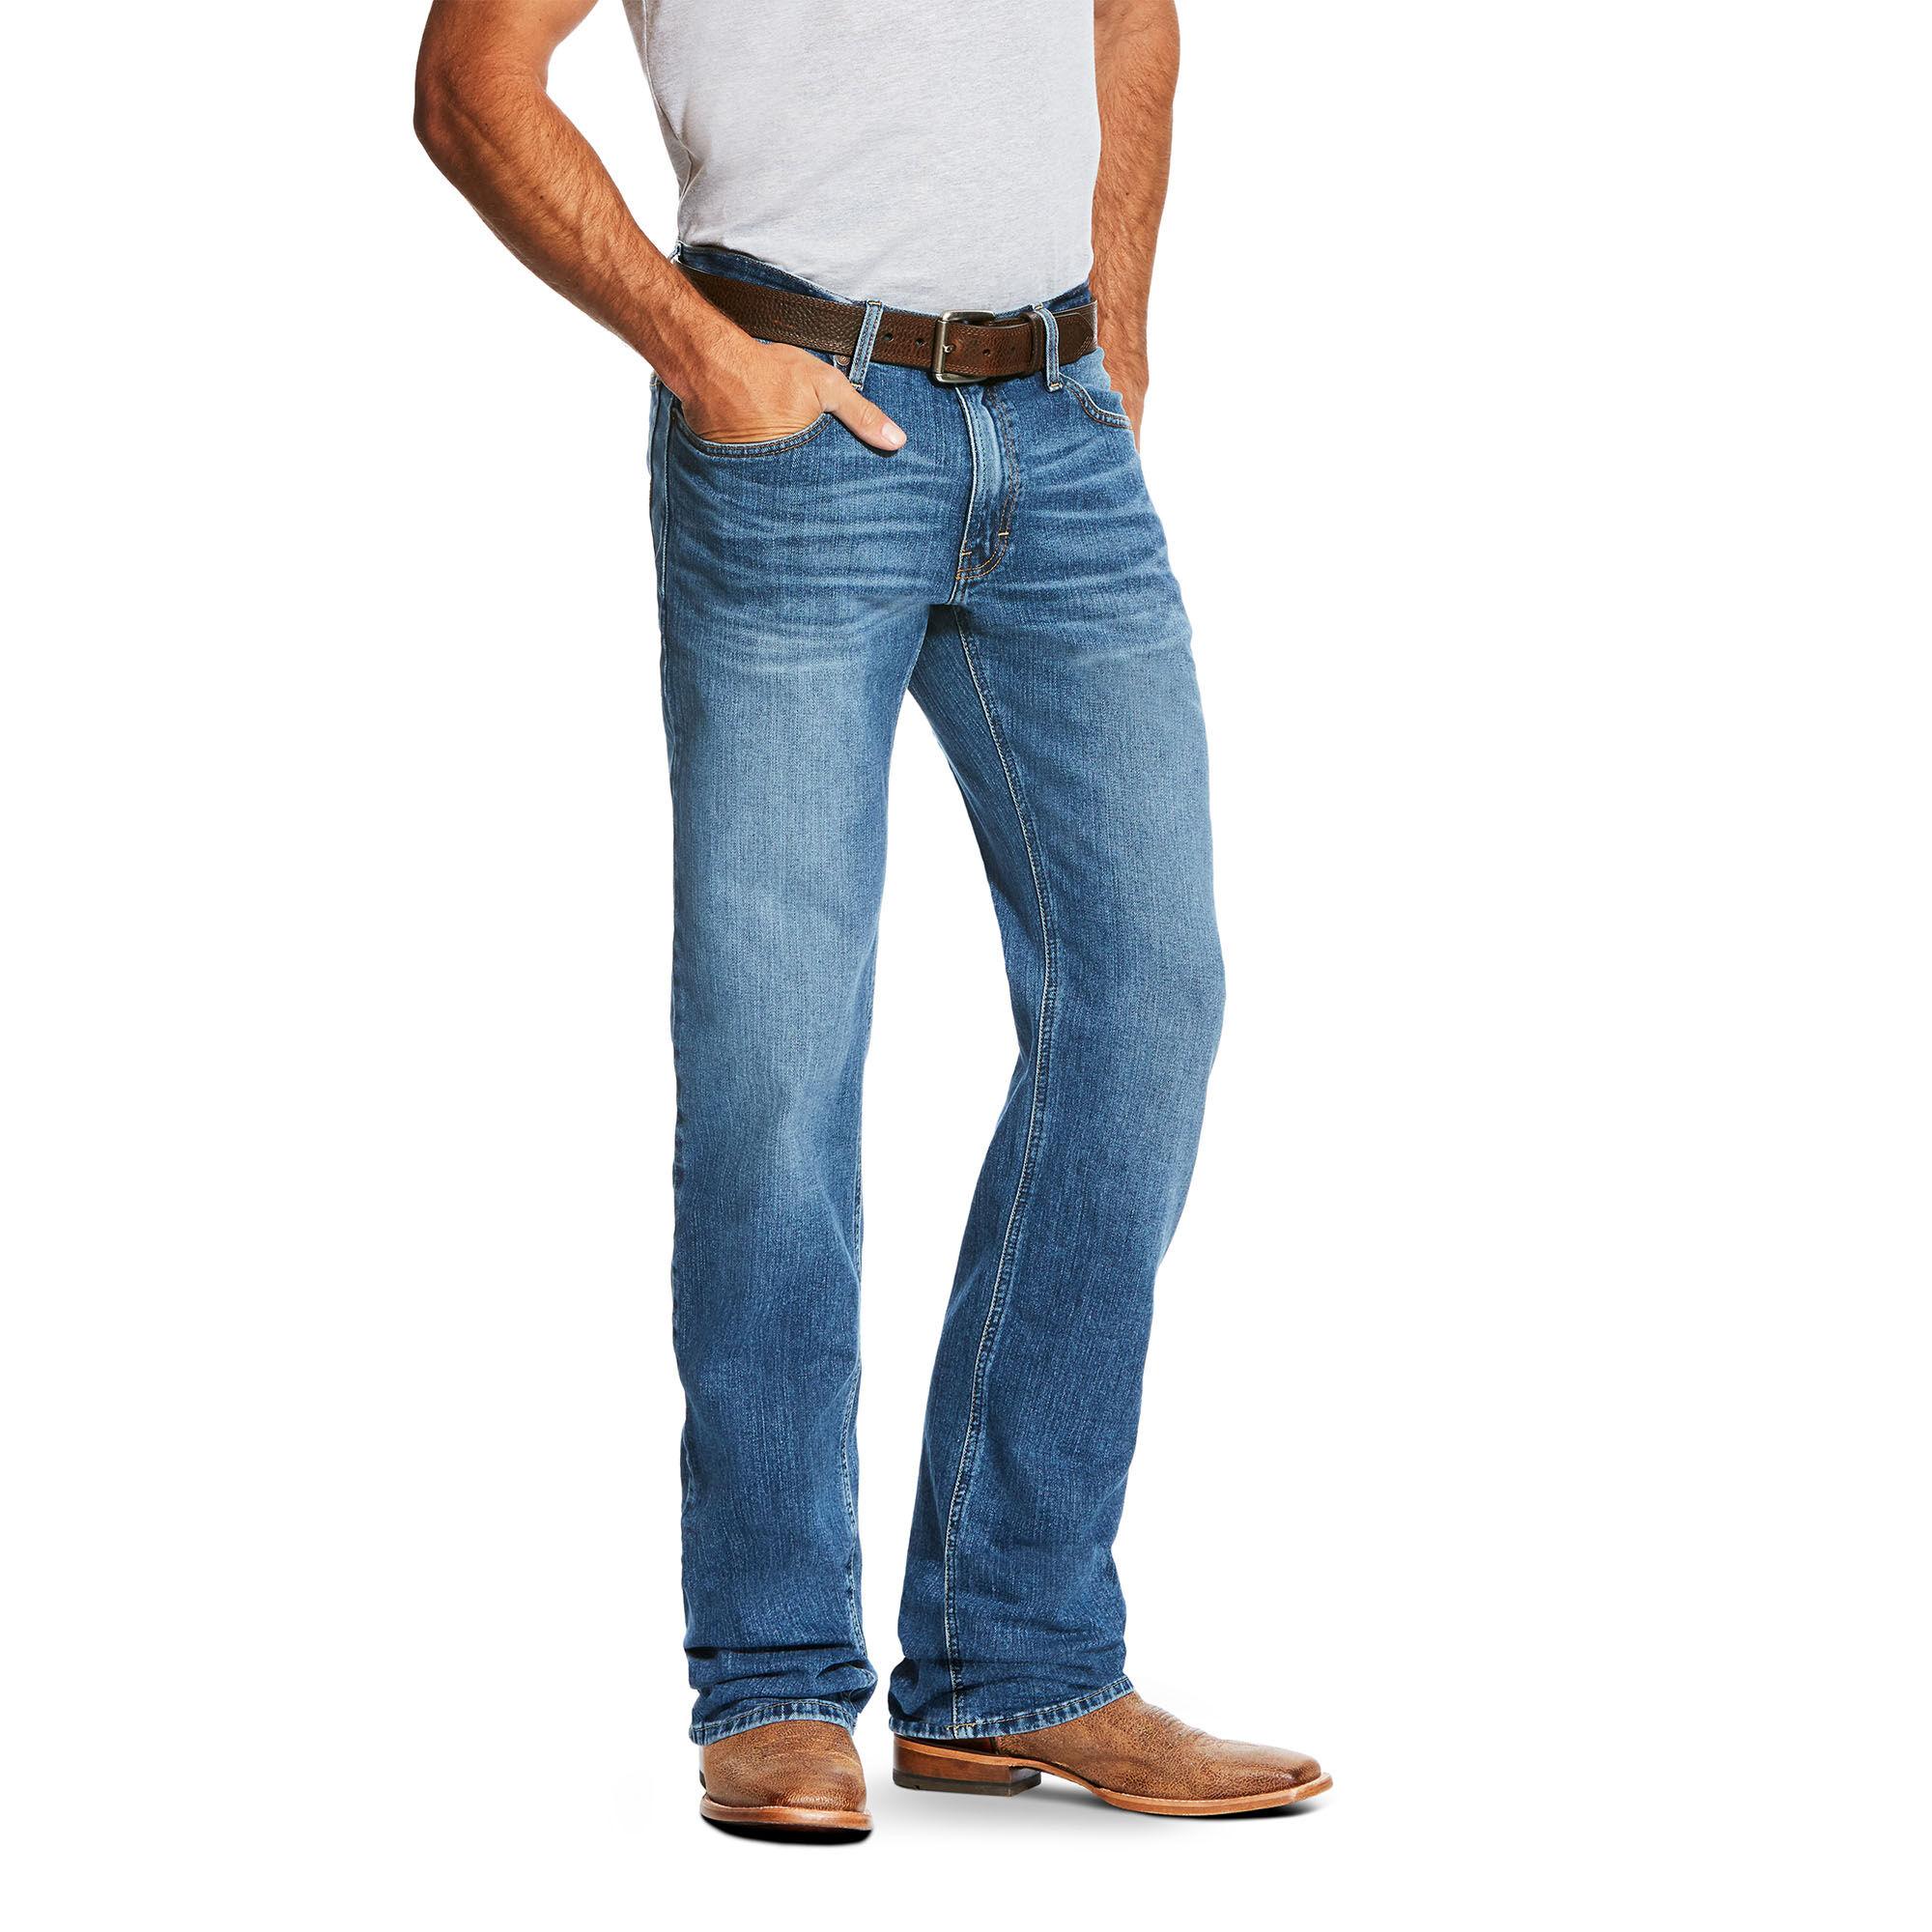 Ariat Men/'s M2 Relaxed Boot Cut Performance Pants size W 31 L 32 Khaki Stone